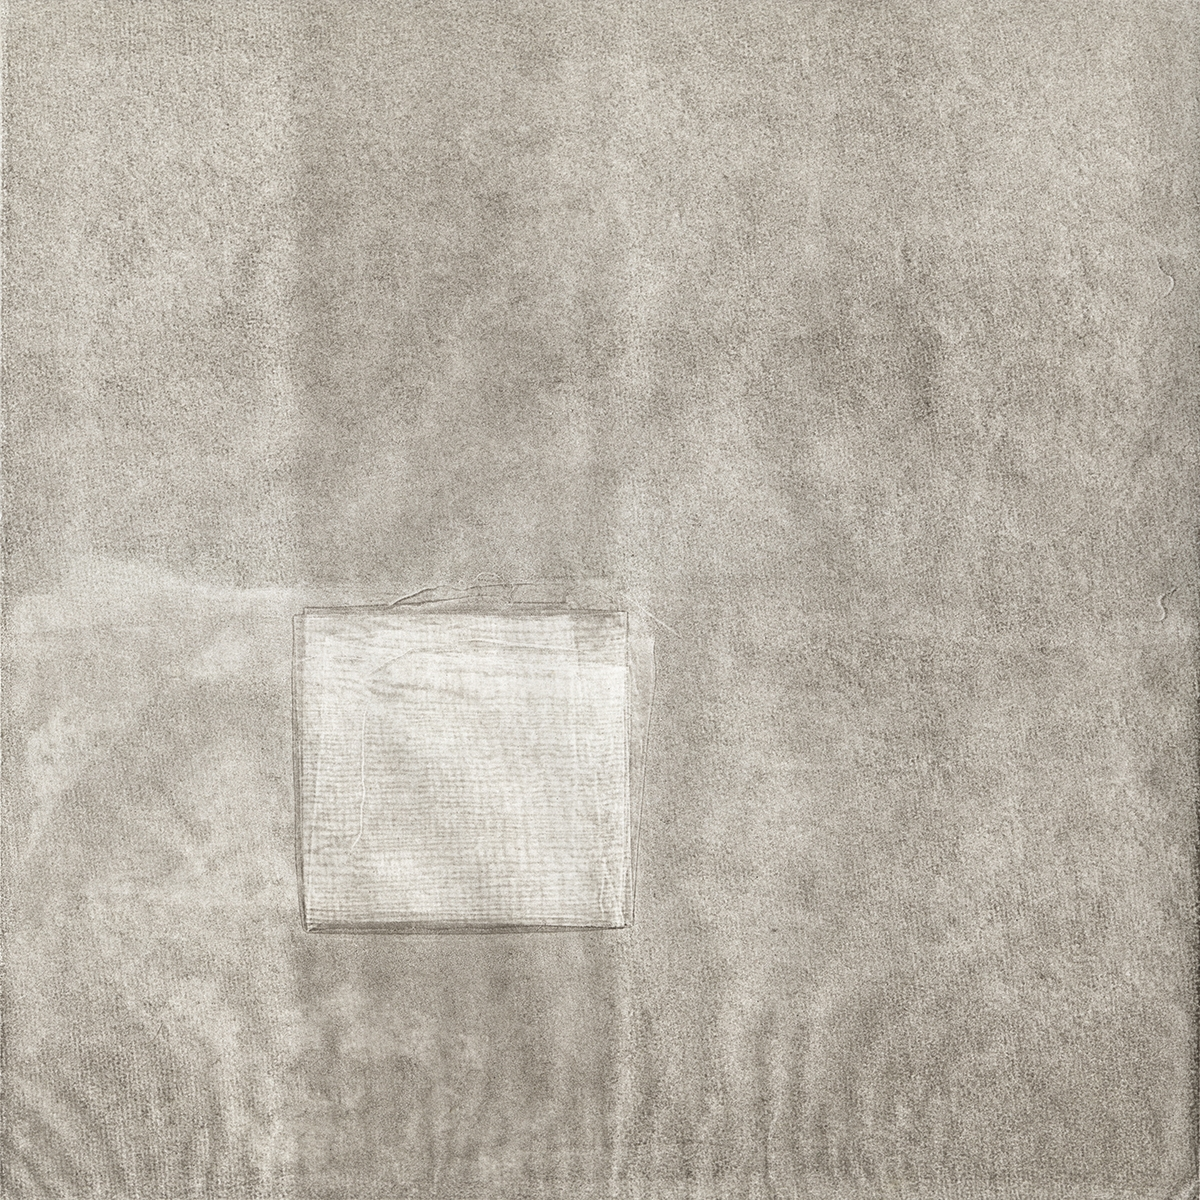 Smallest Fold (Footprint)